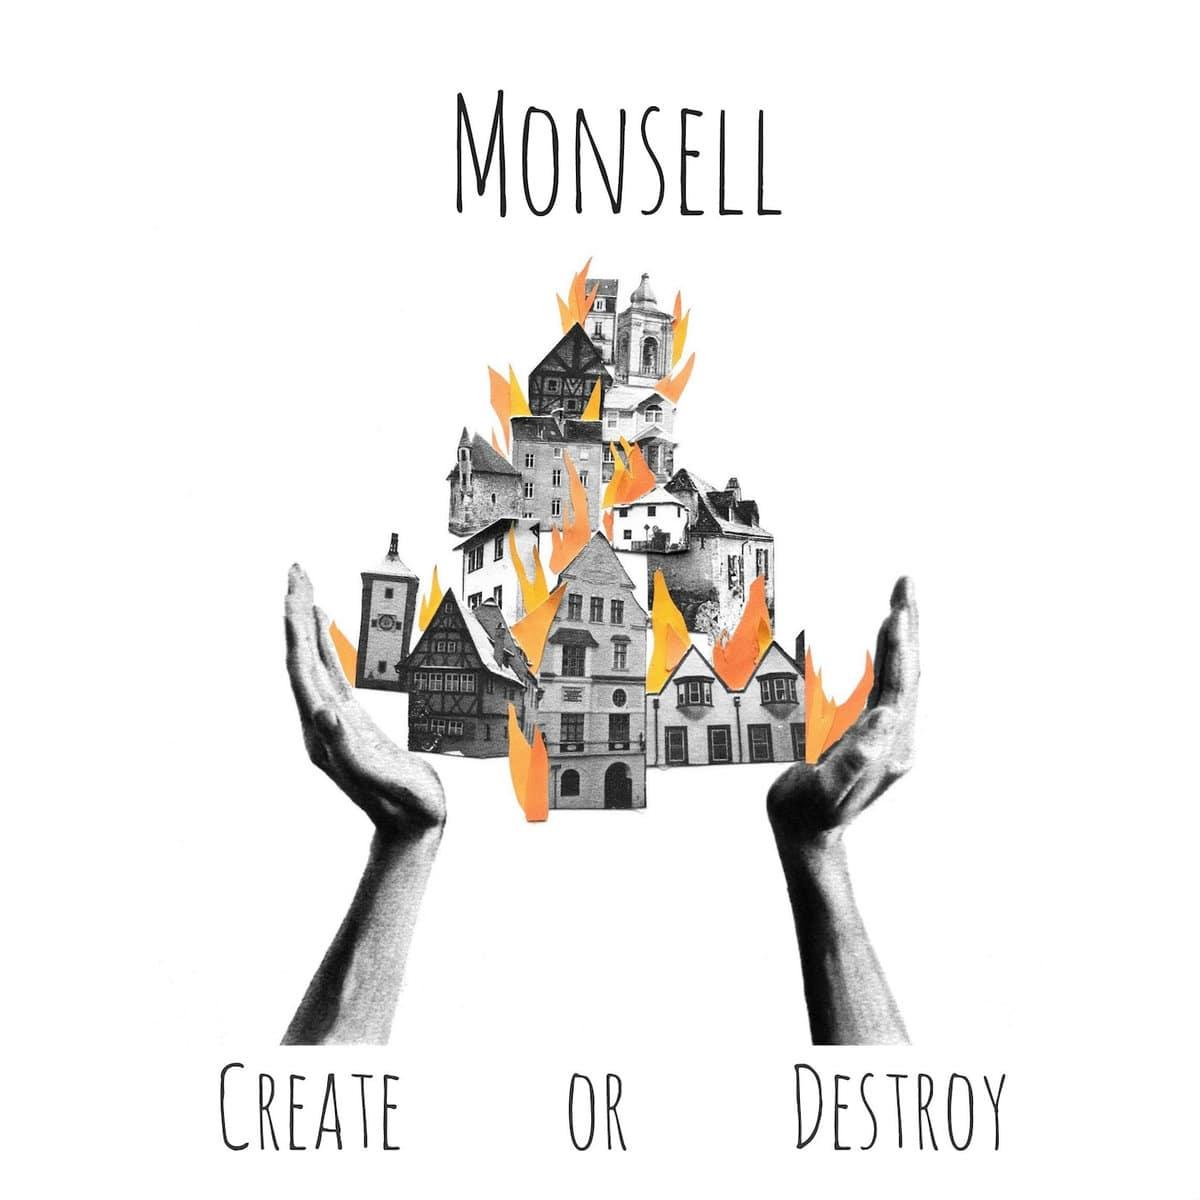 monsell